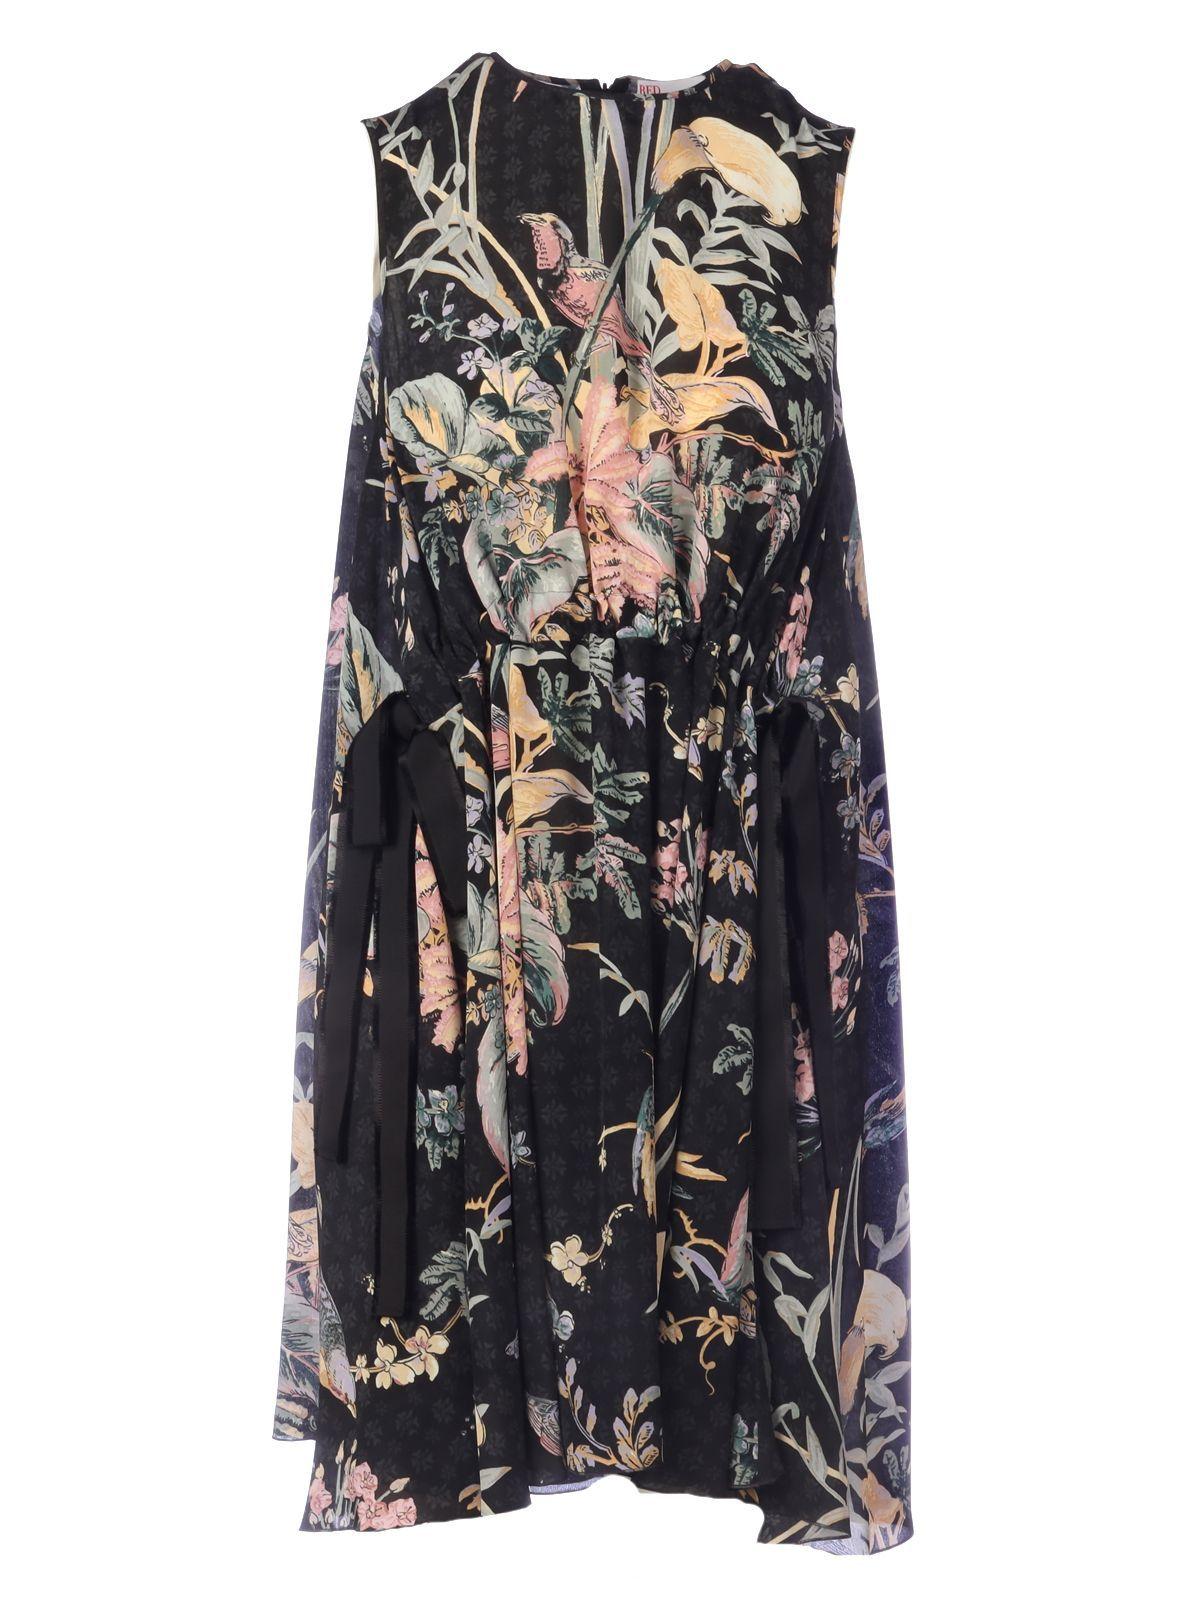 RED VALENTINO WOMEN'S TR3VAM054RS0NO BLACK SILK DRESS